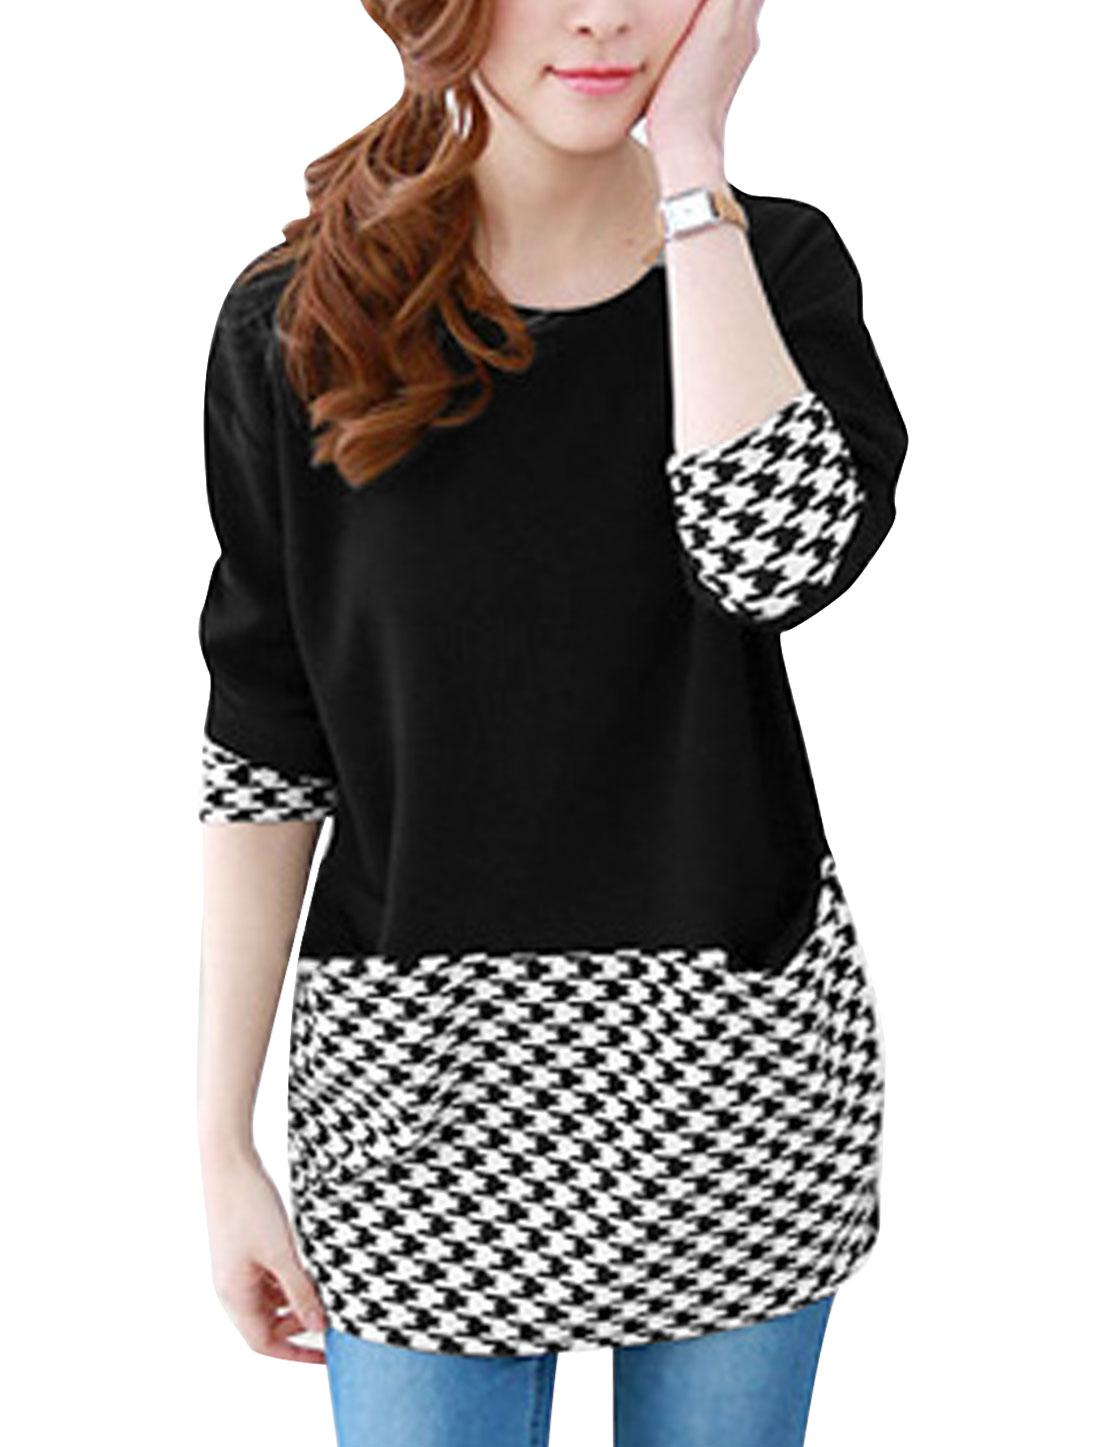 Ladies 3/4 Sleeves Houndstooth Pattern Panel Tunic Top Black S